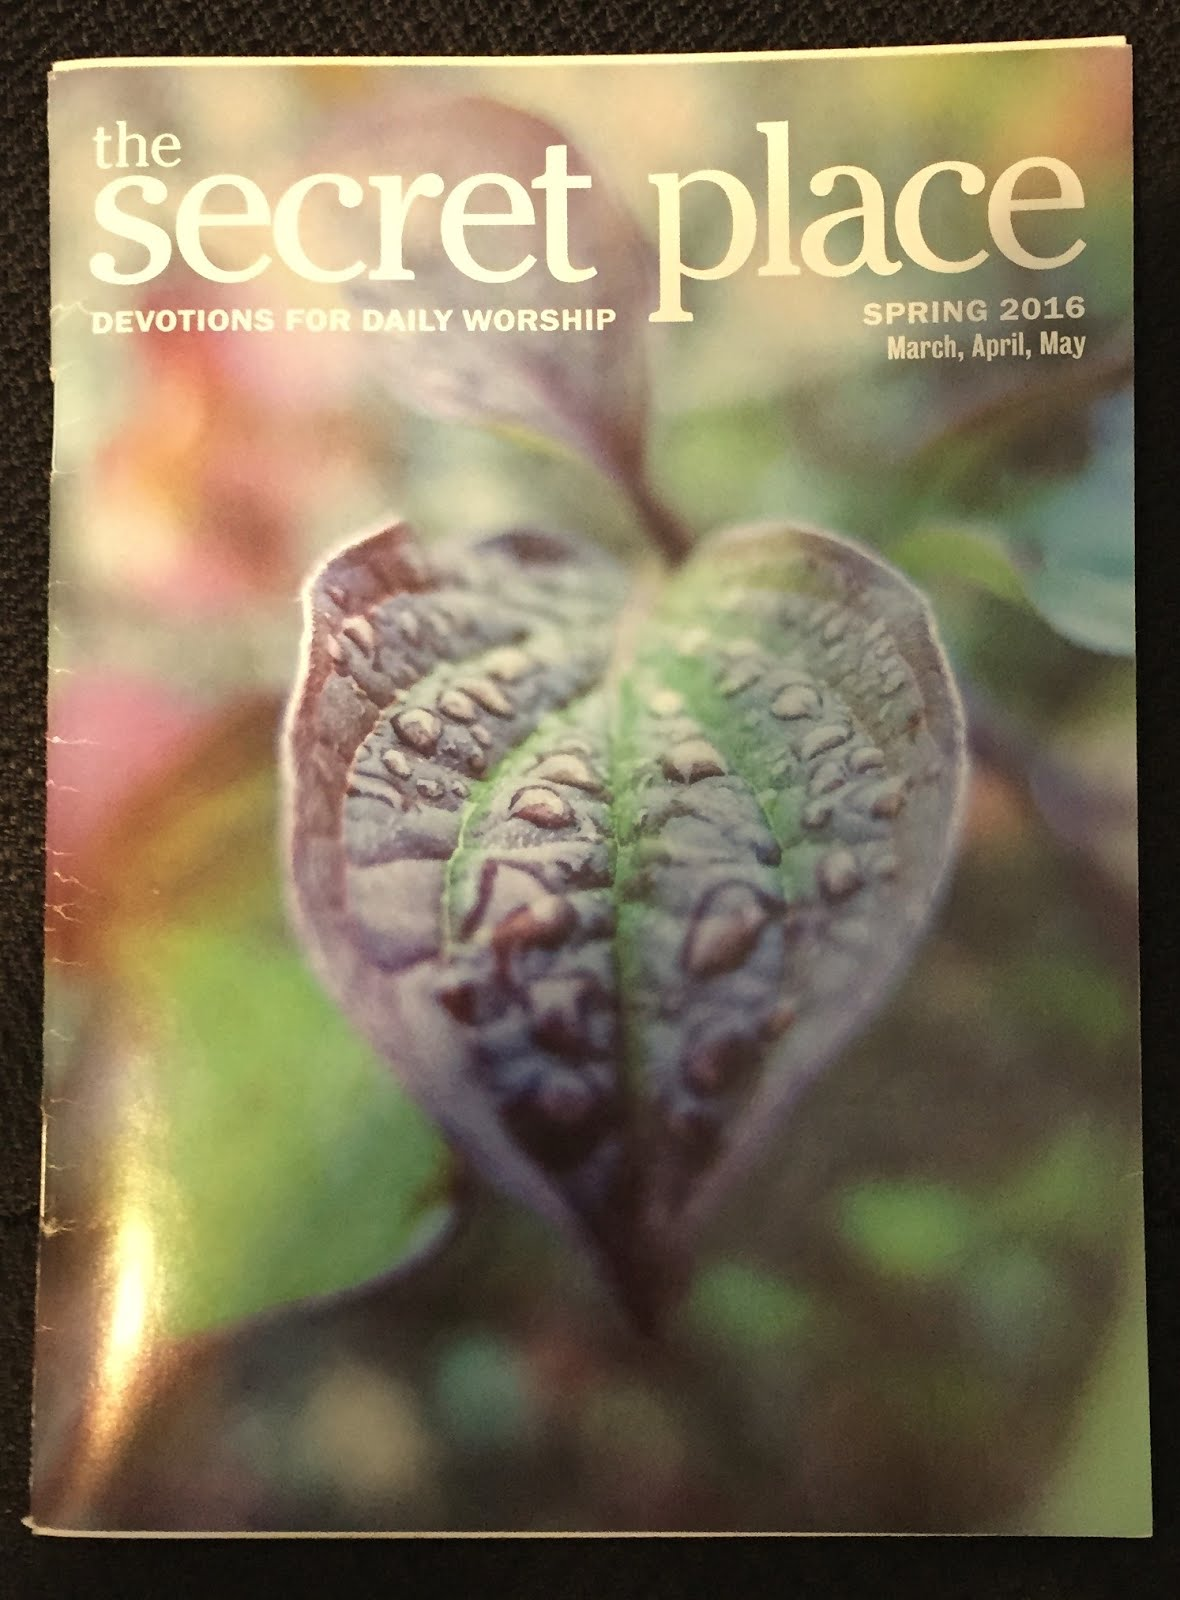 My latest magazine publlication